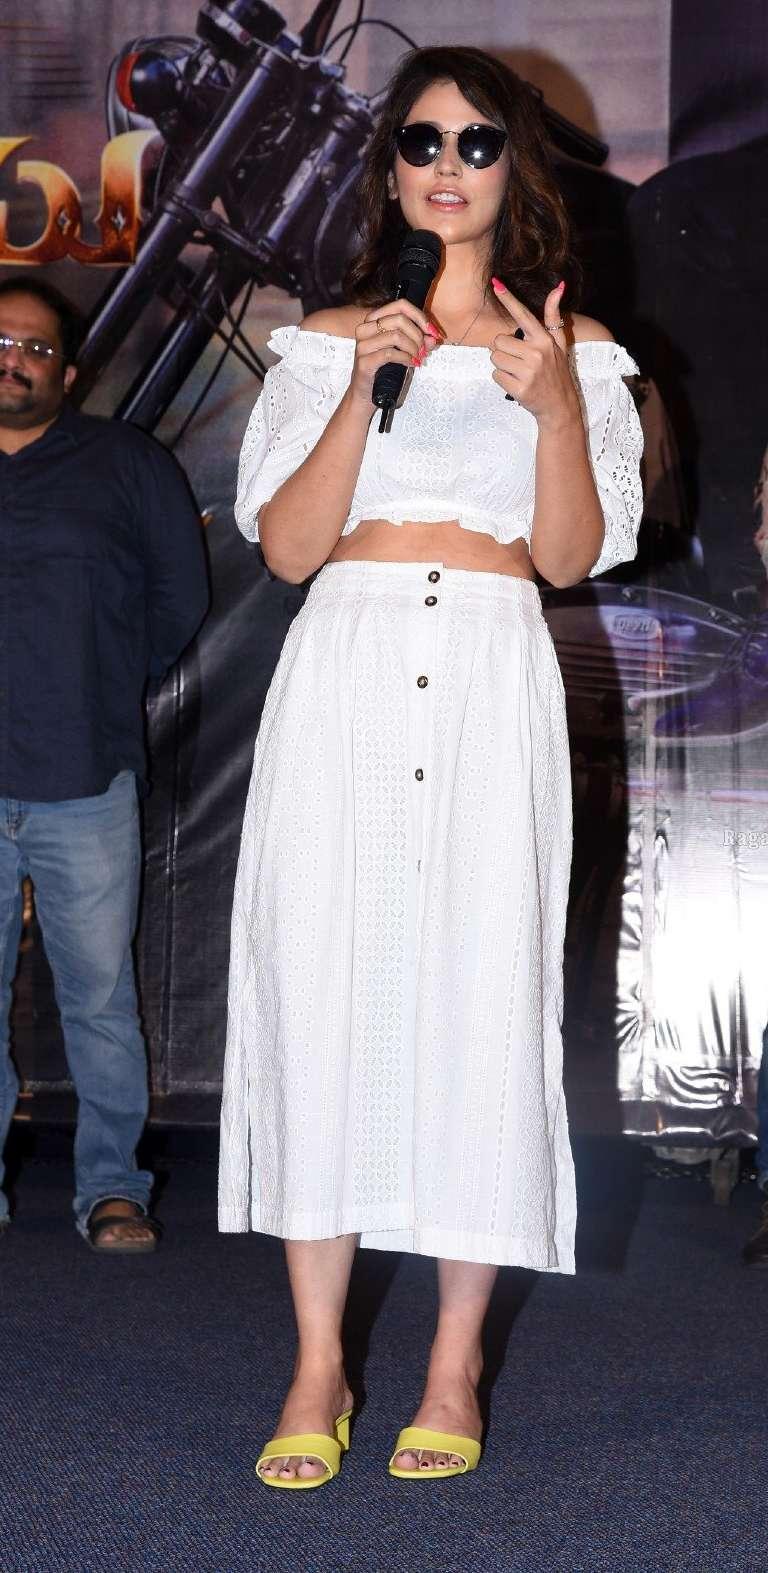 Priyanka jawalkkar in white skirt and crop top at Thimmarusu press meet